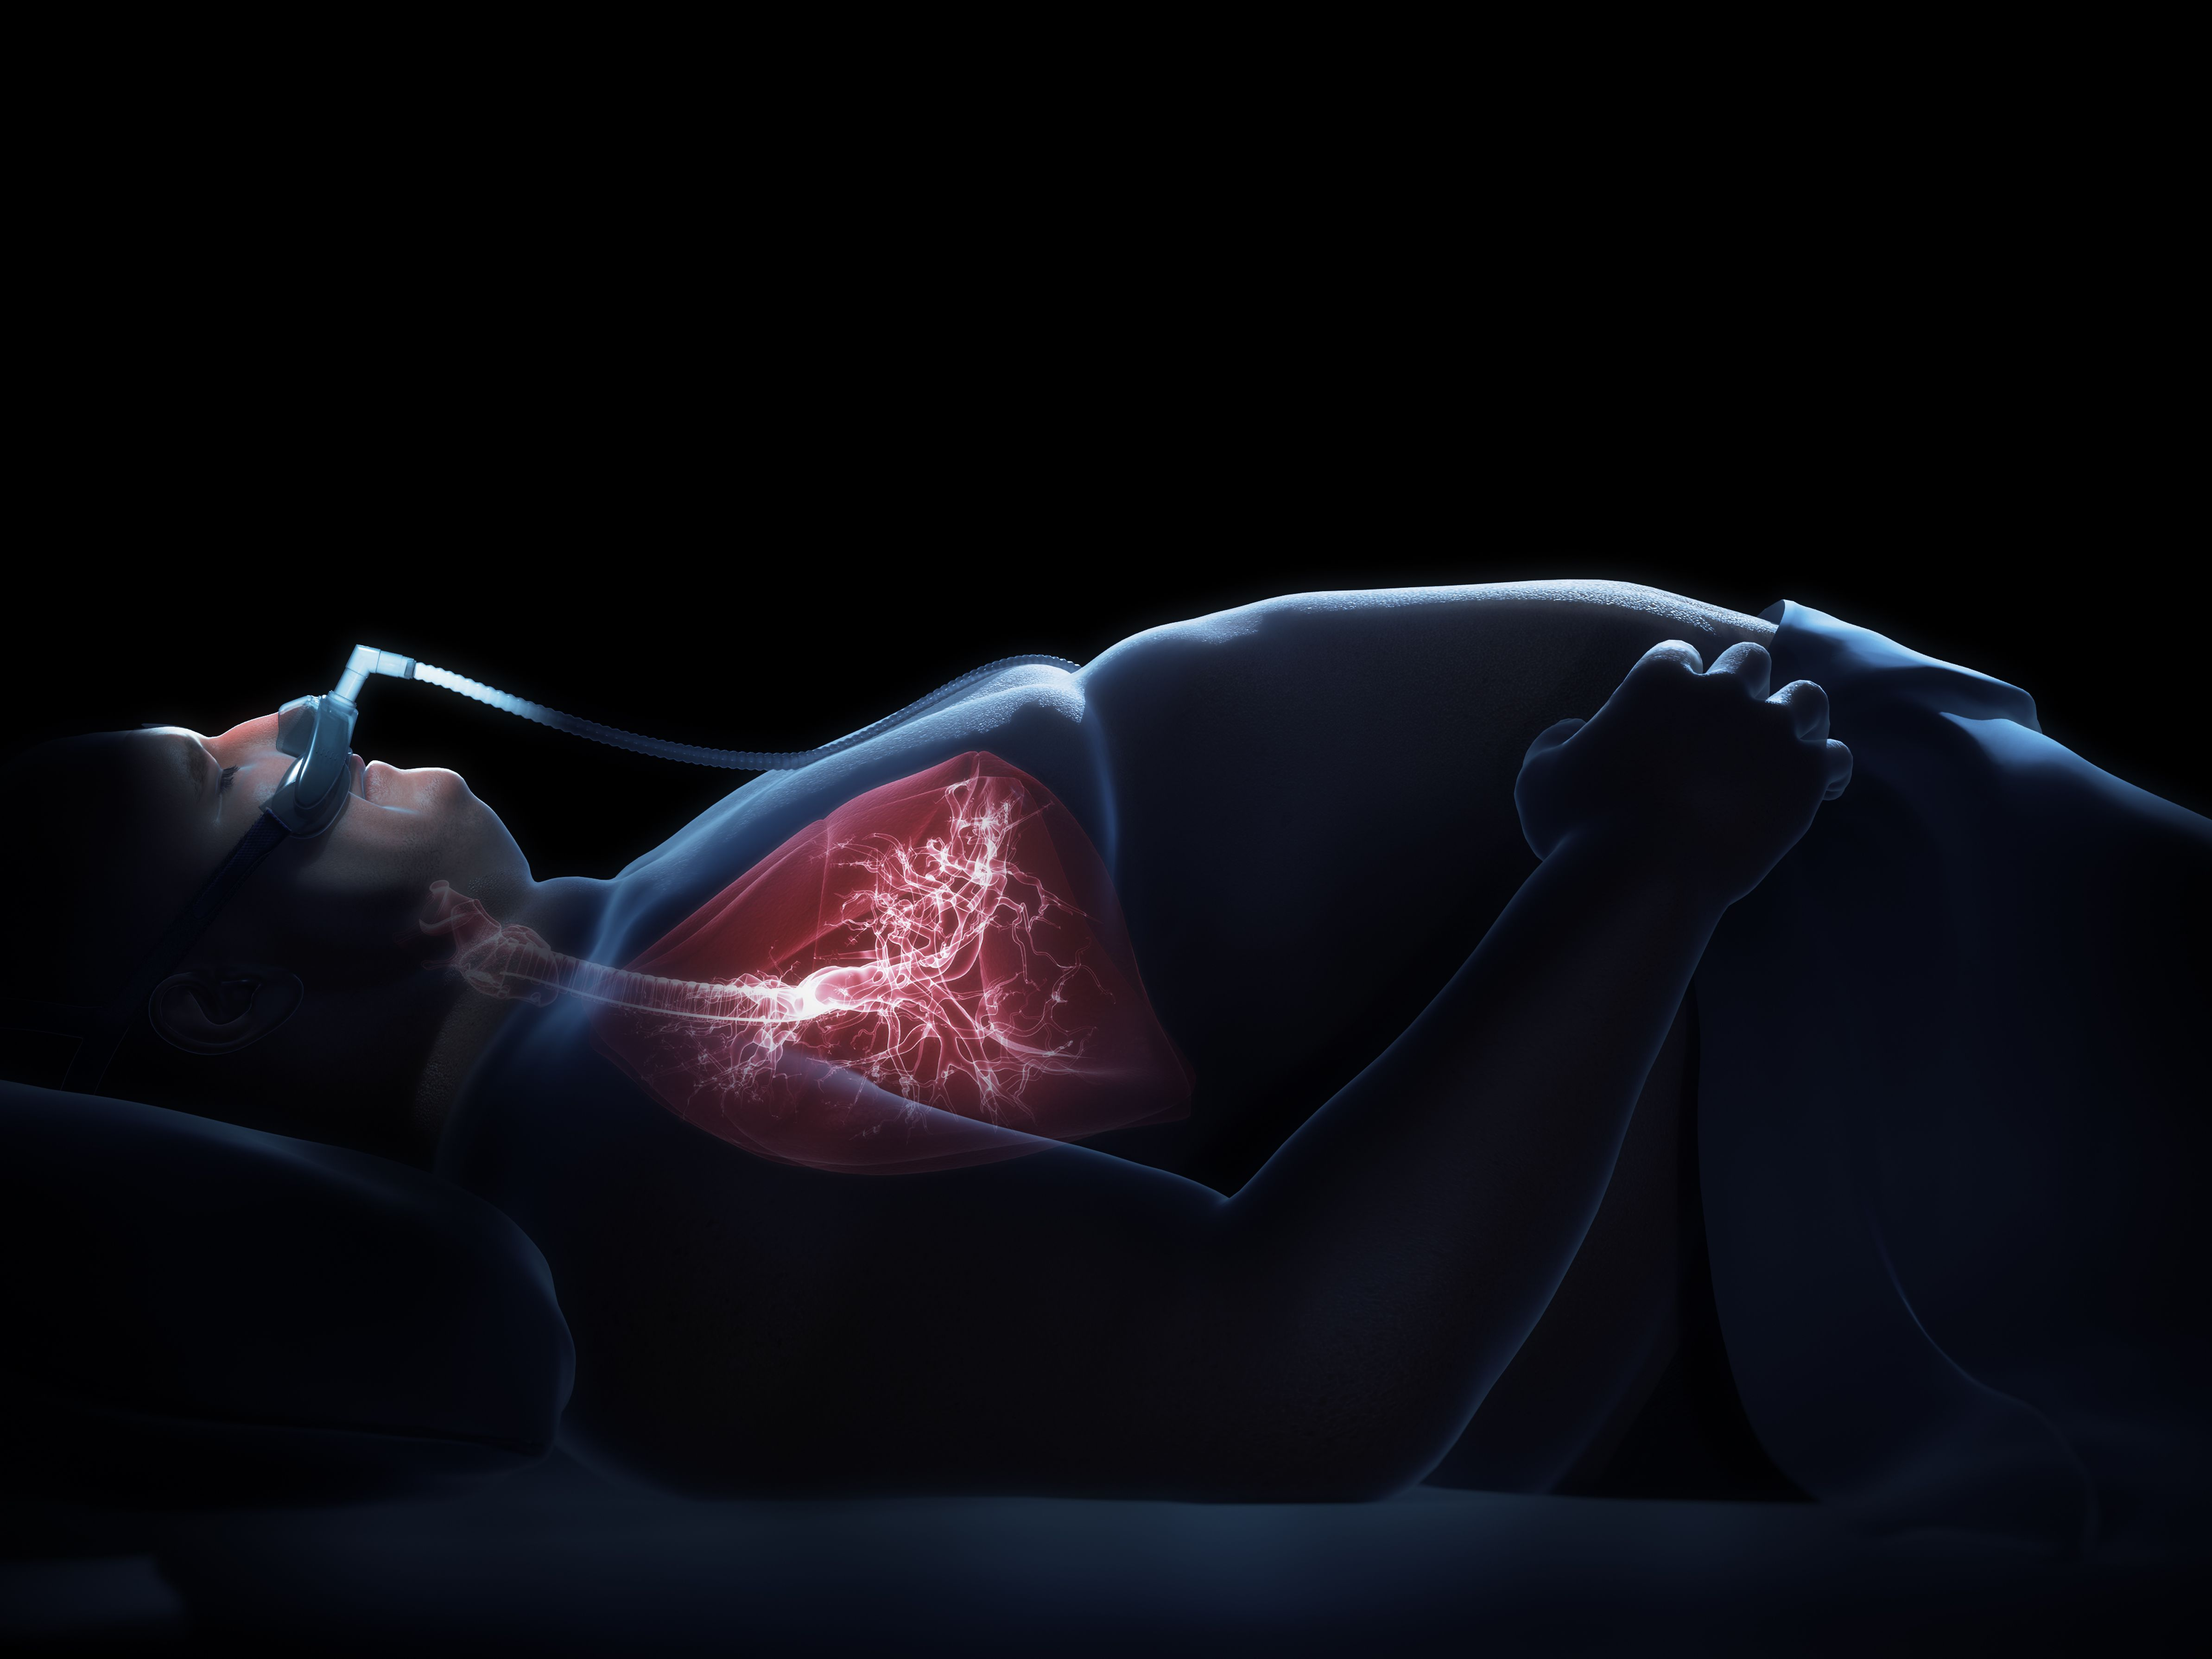 Does Sleep Apnea Go Away? Risk Factors and Prognosis